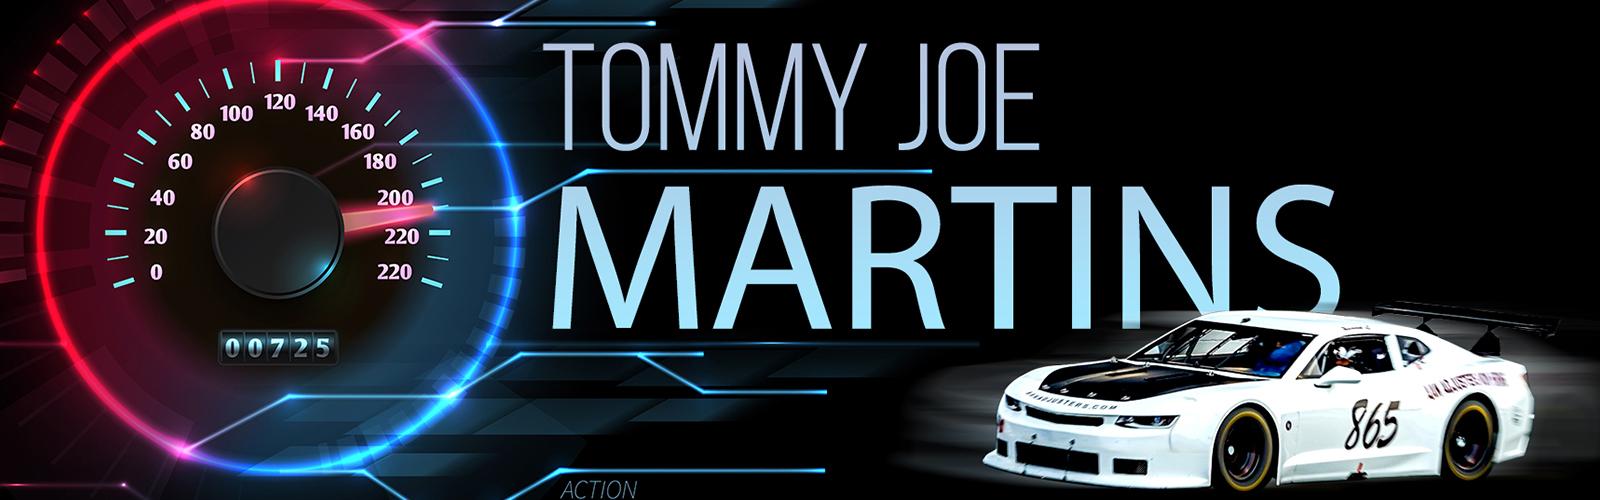 NASCAR Xfinity Race Series